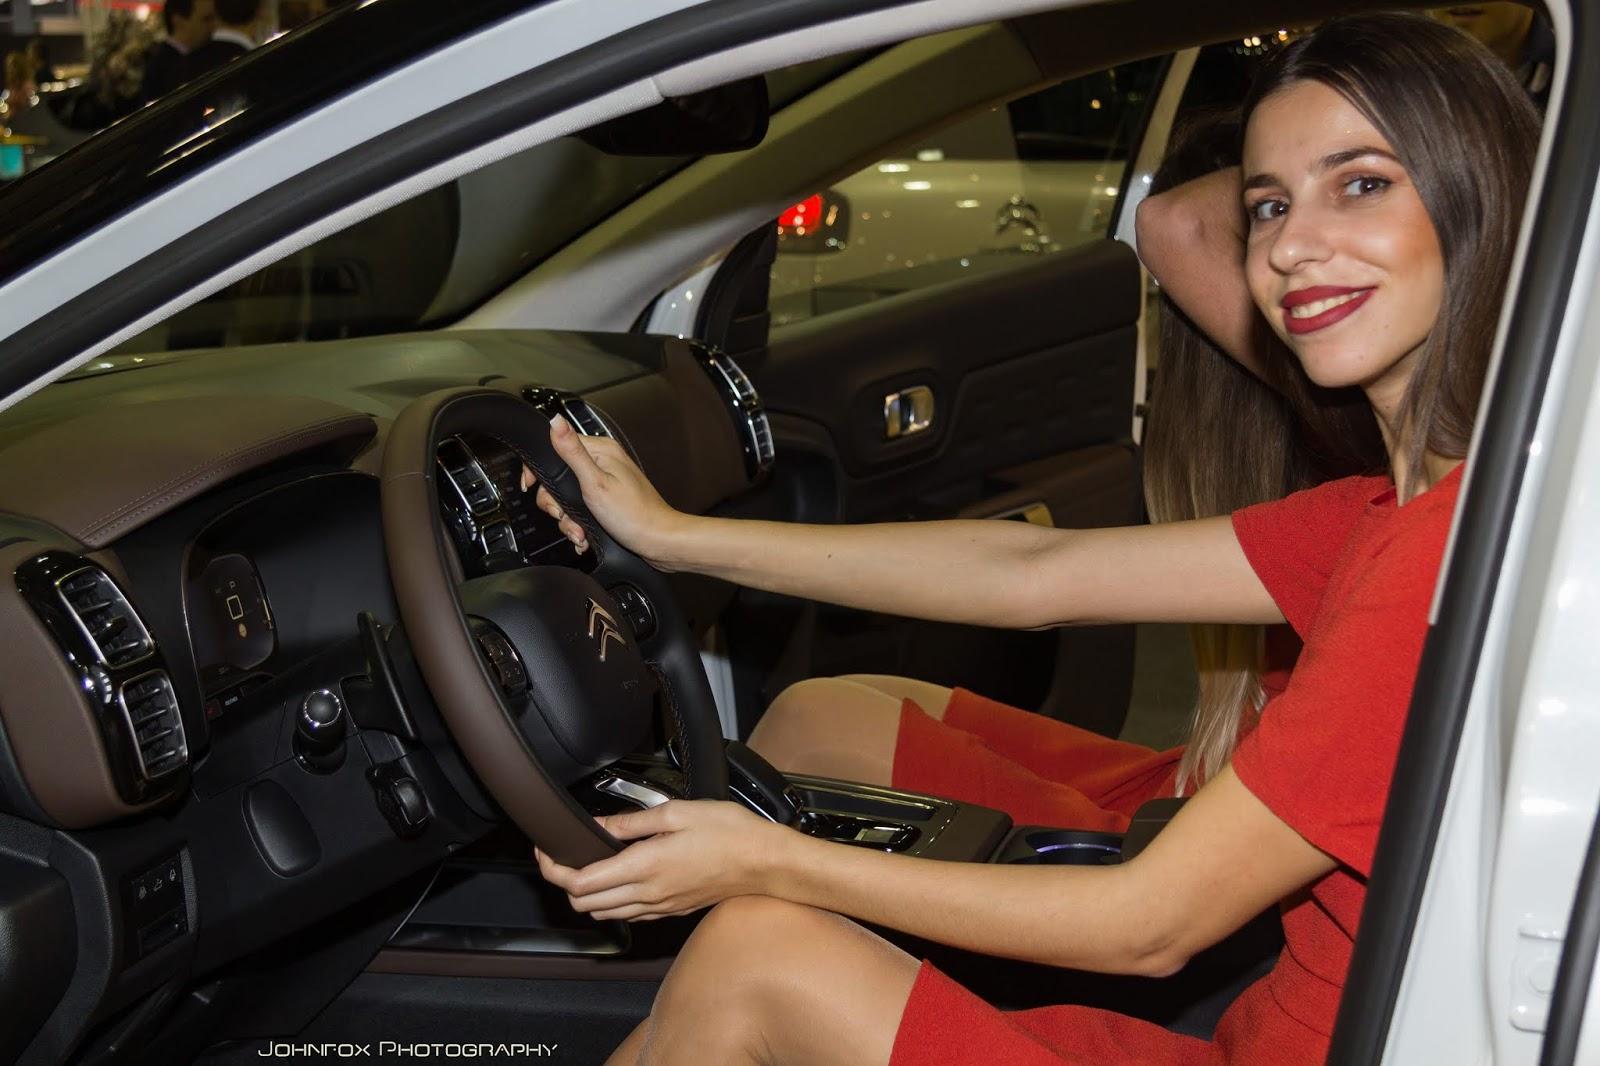 models2B2528222Bof2B232529 Τα κορίτσια της Αυτοκίνησης! Έκθεση, μοντέλα, ΦΩΤΟ, φωτογραφίες